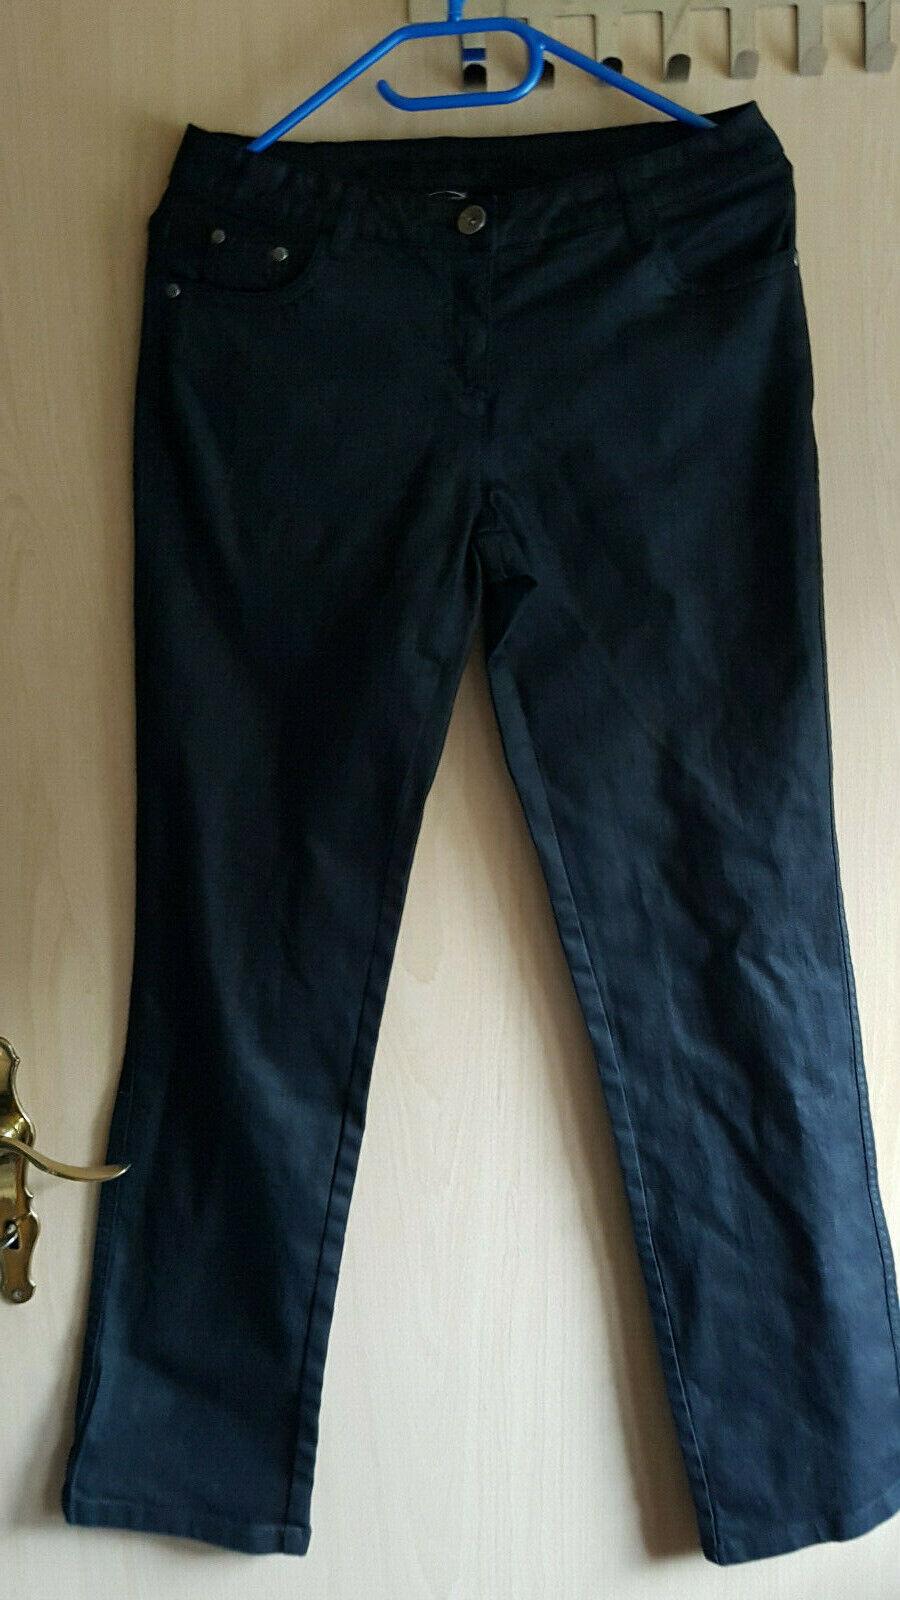 ❤️ CECILIA CLASSIC❤️Hose Schwarz Gr. 38/40 ❤️ NEU Stretch 5 Pocket Style sh.Maße